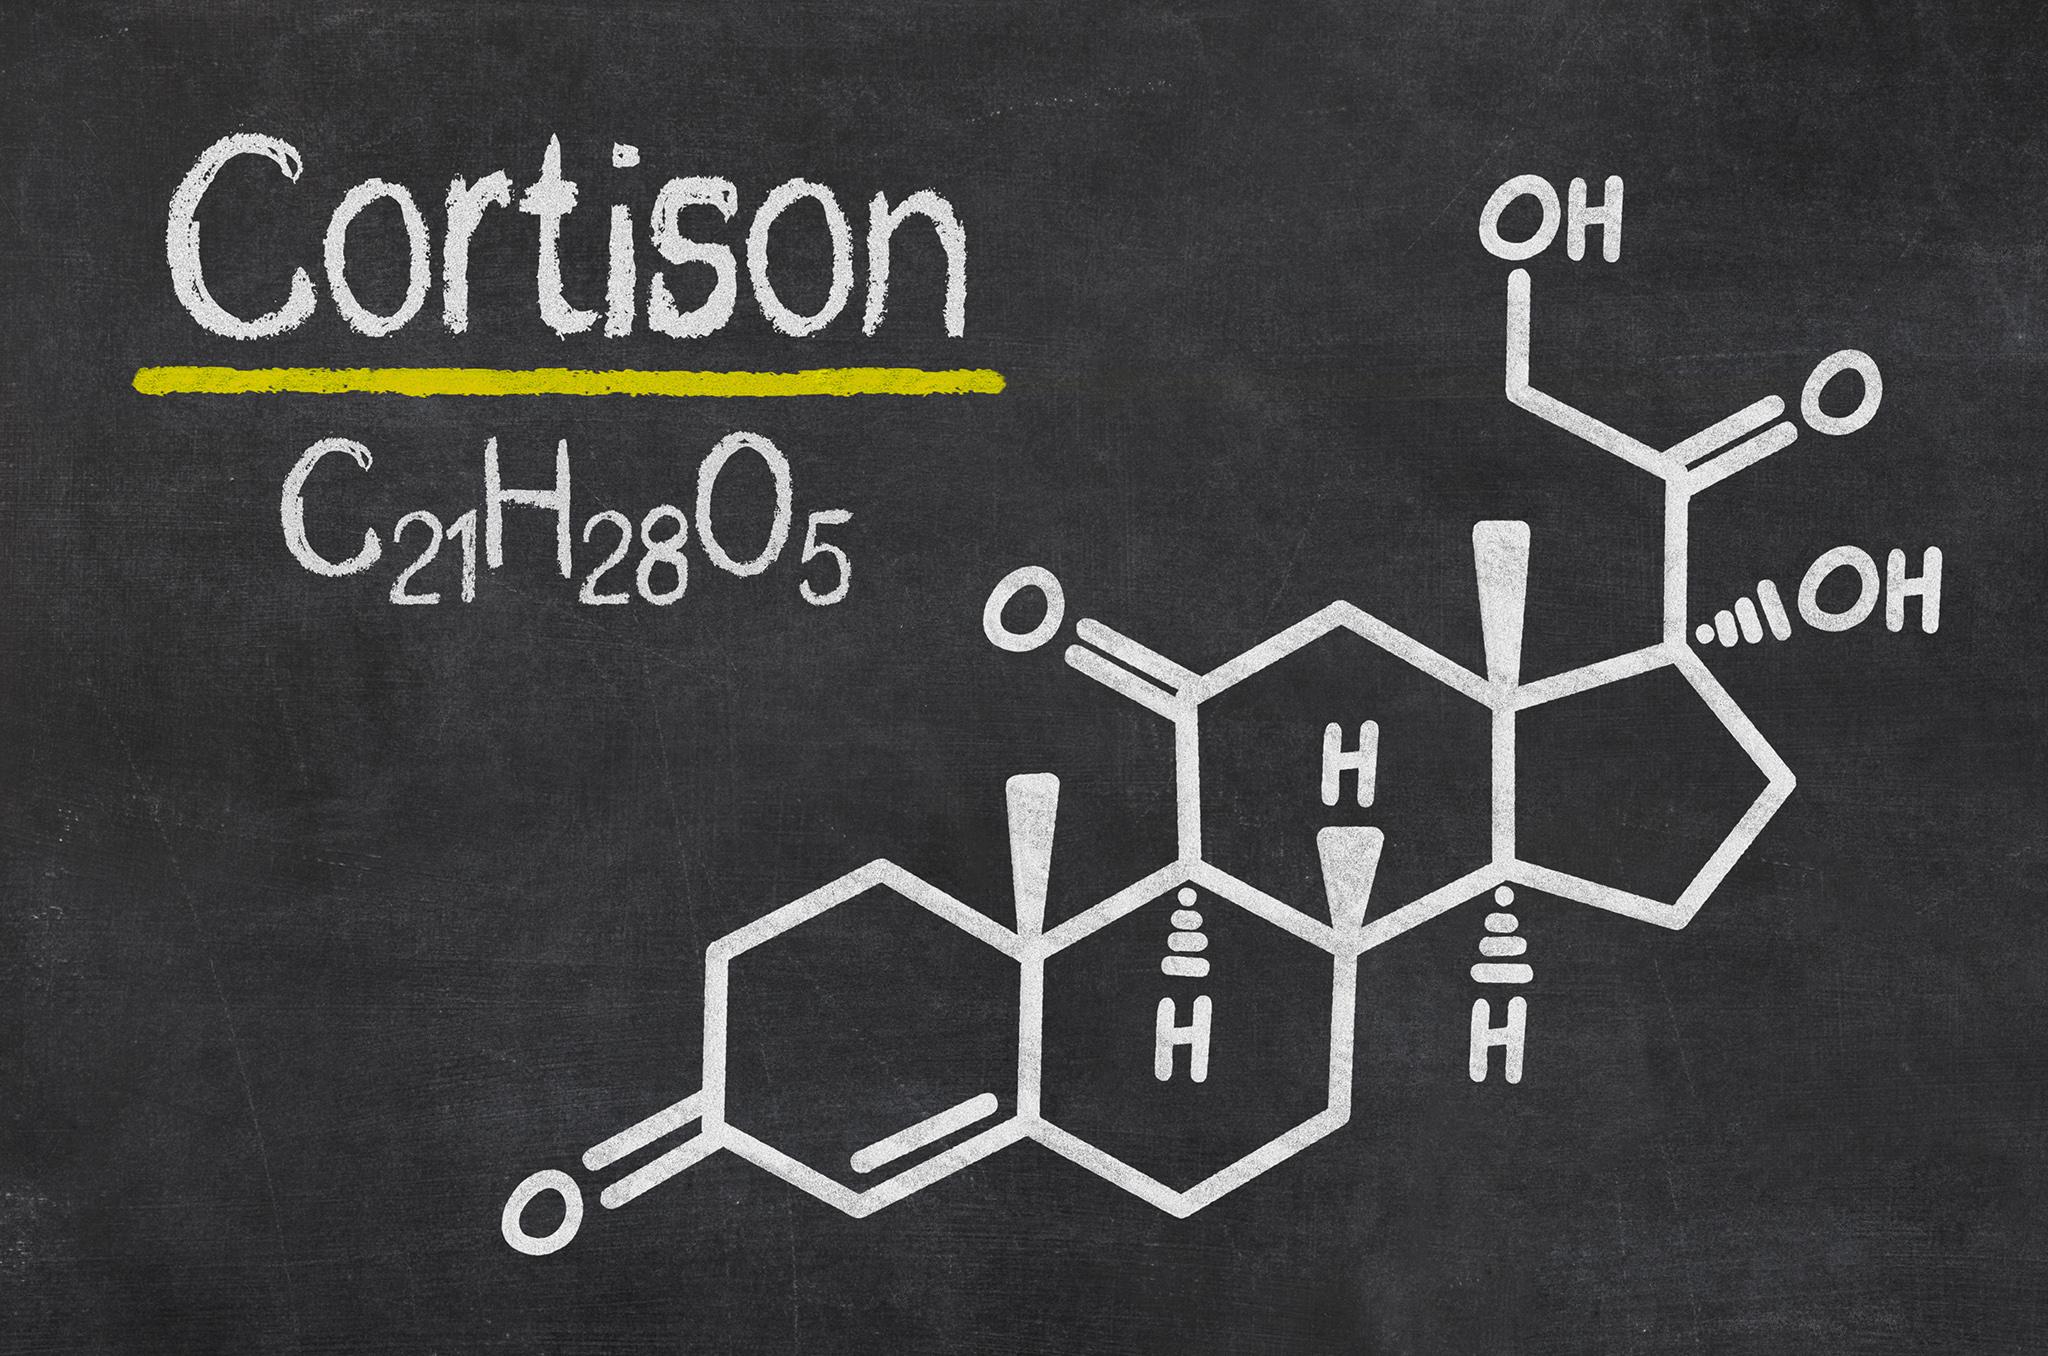 Cortison